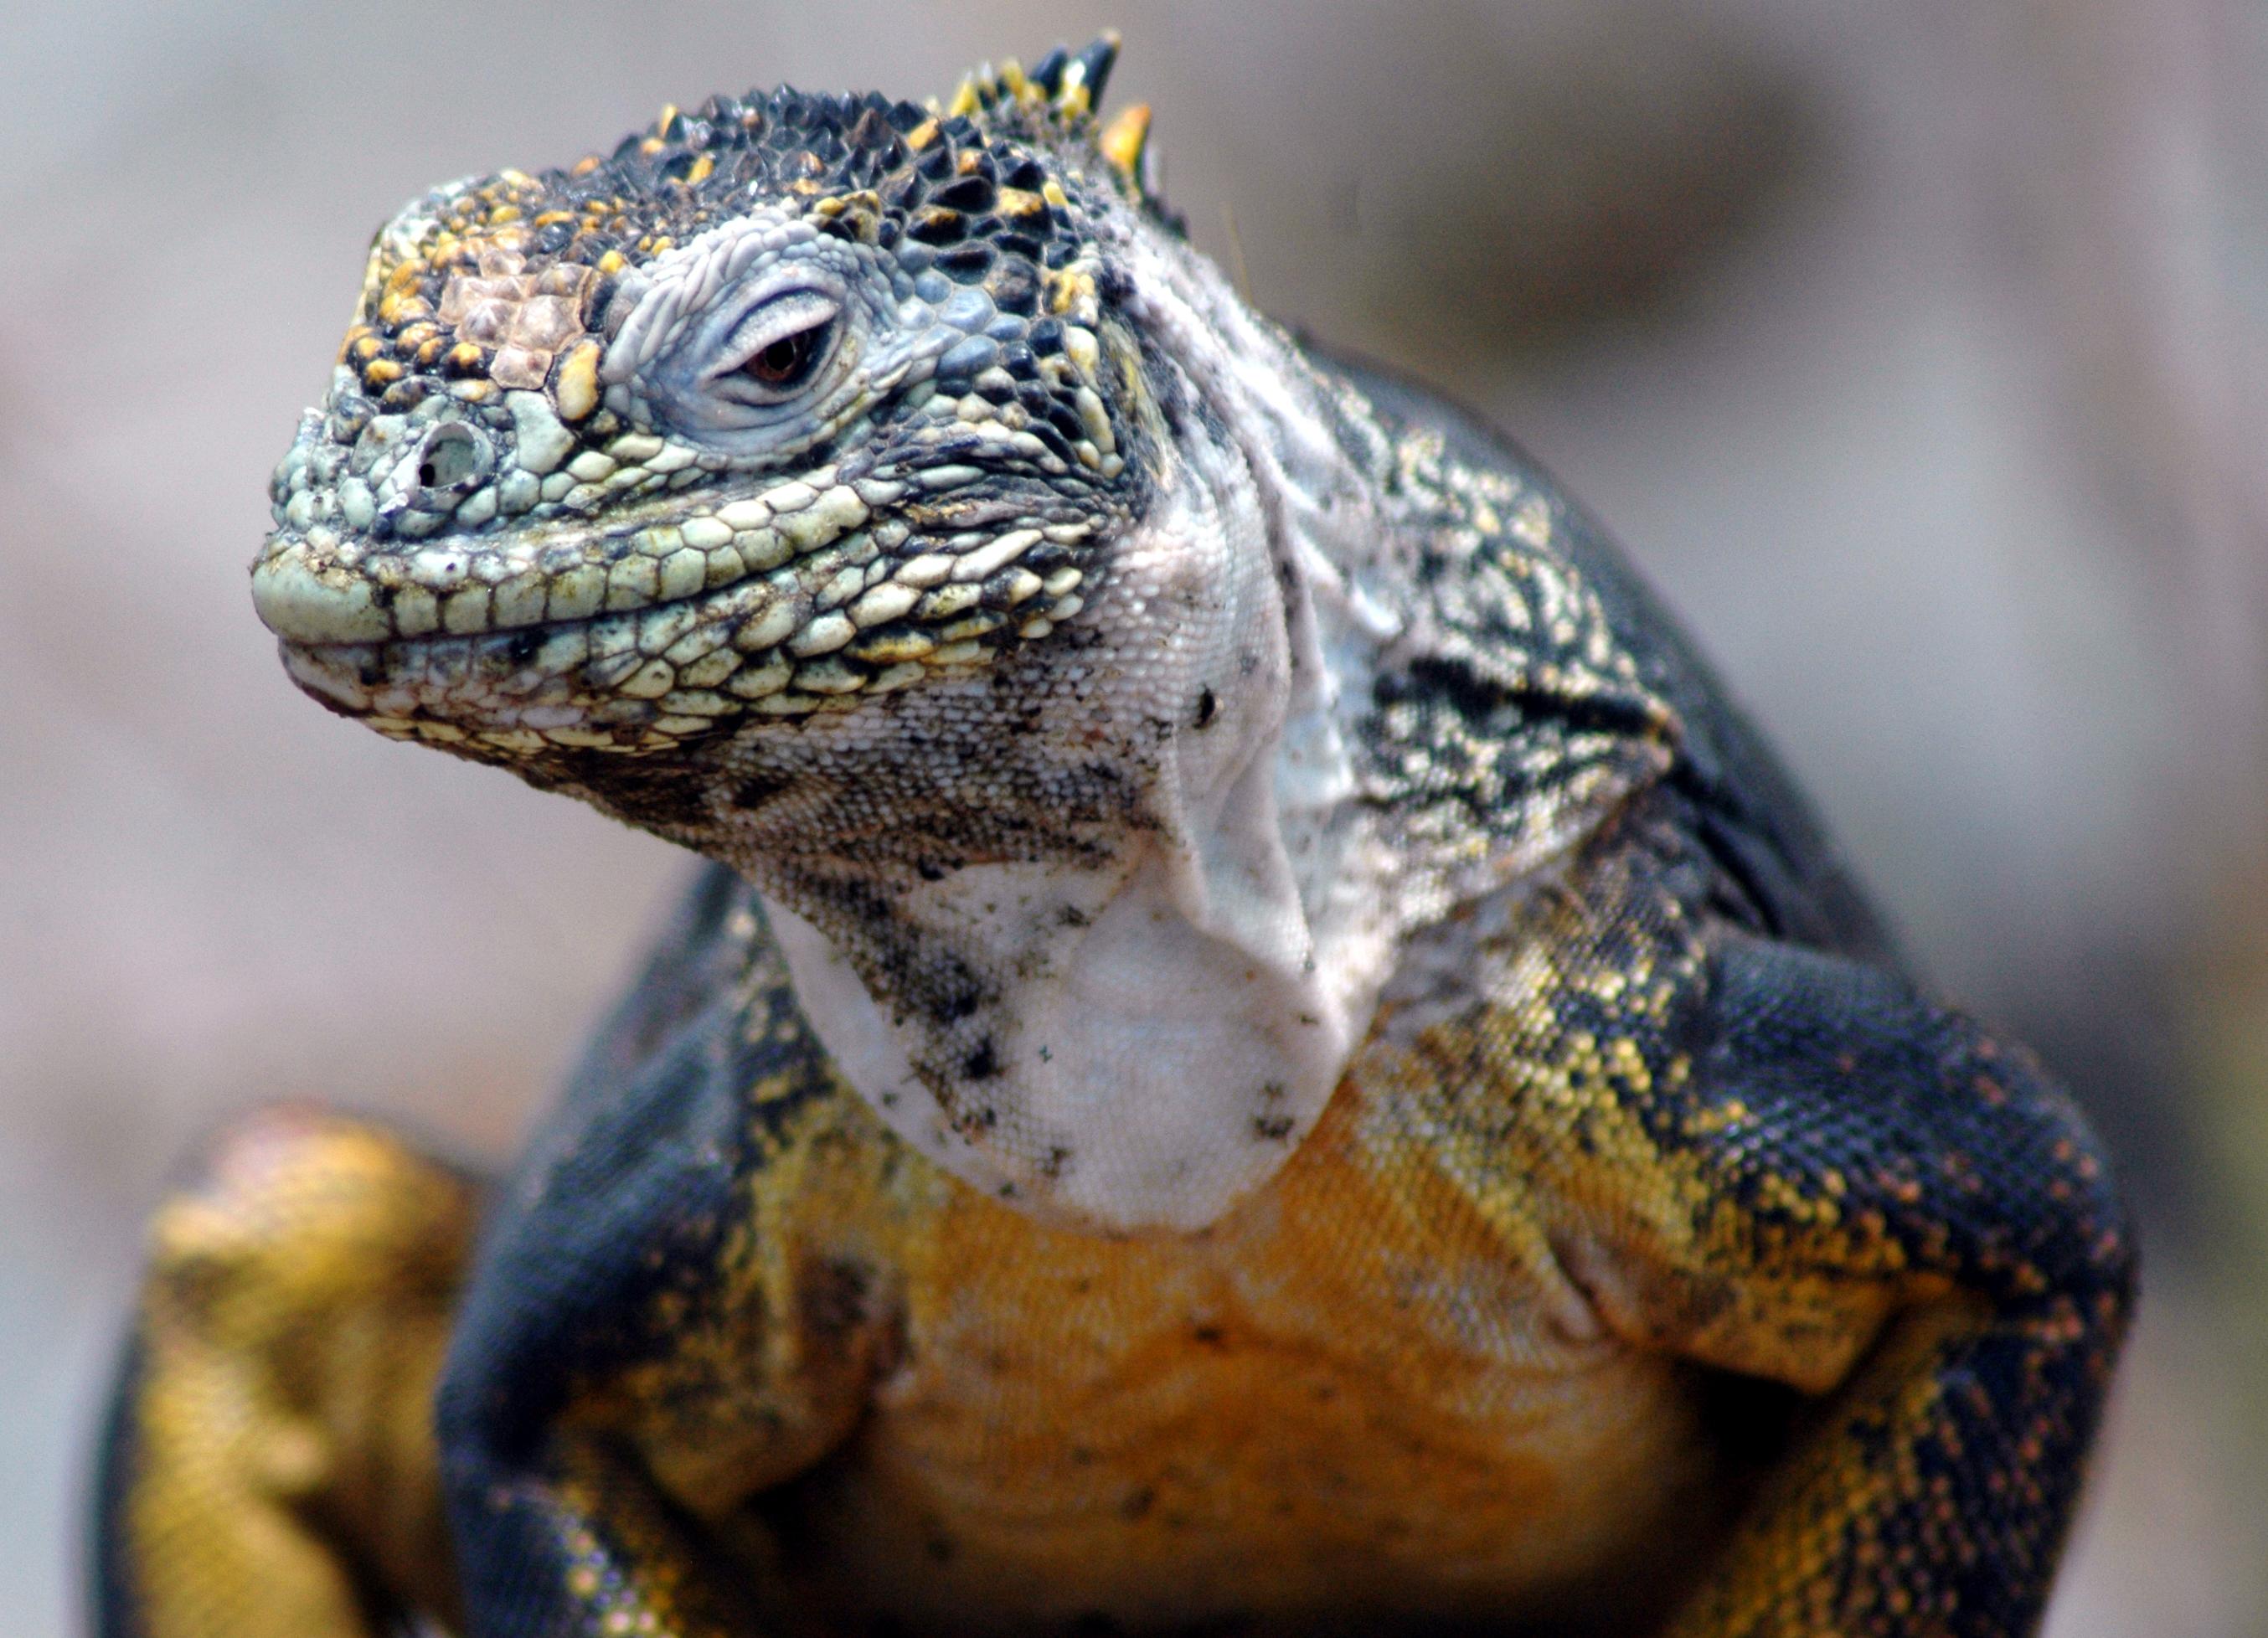 File:Galapagos Islands Land Iguana.JPG - Wikimedia Commons